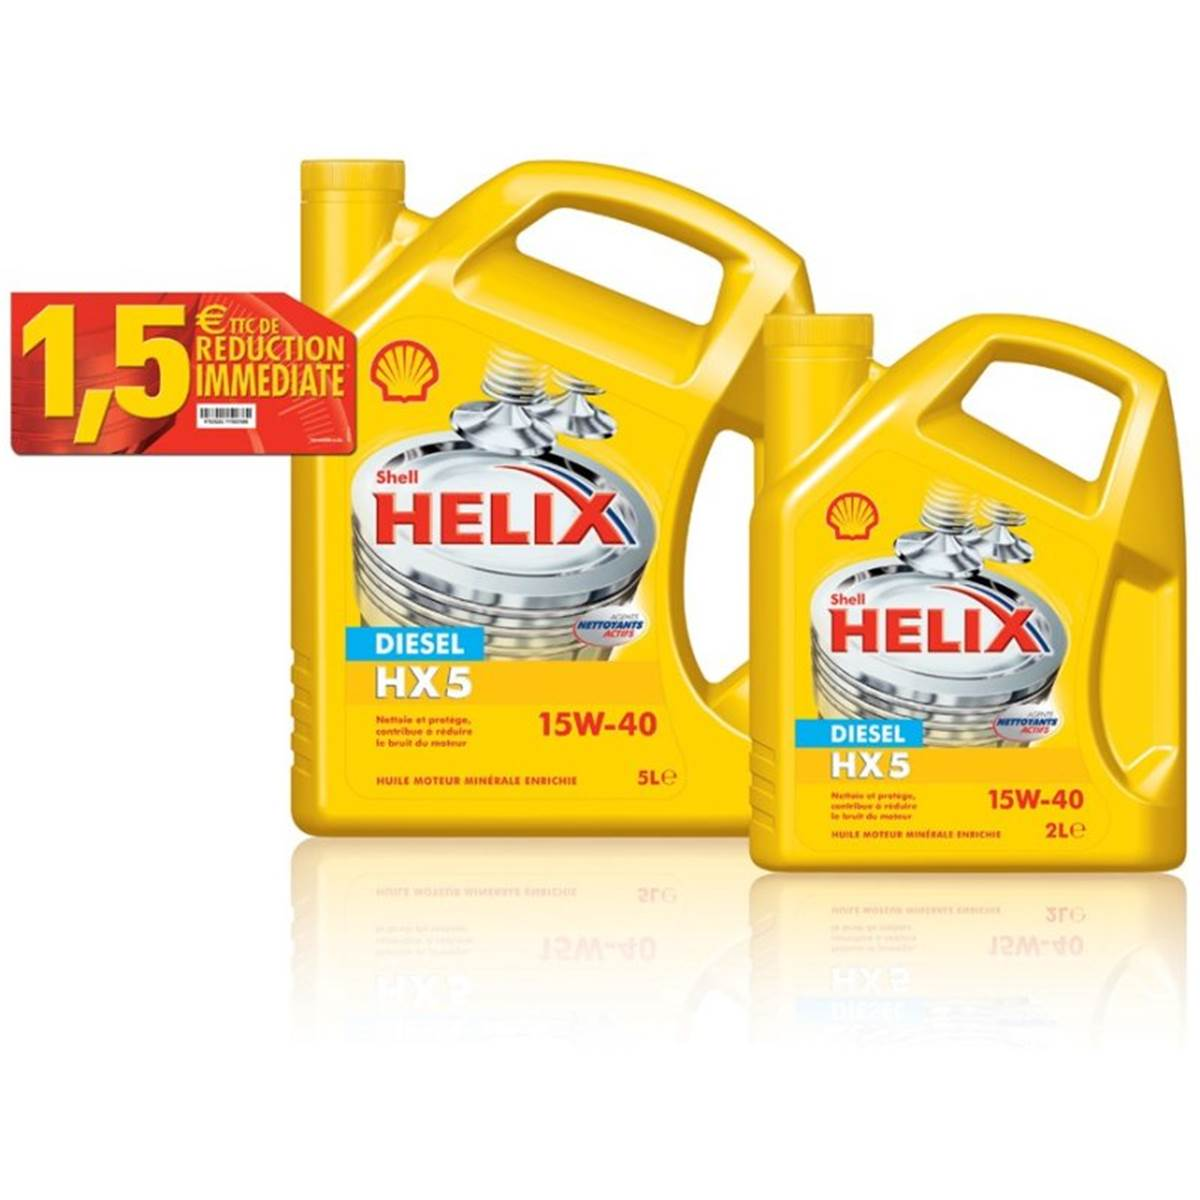 Huile SHELL HX5 diesel 15w40 5L + 2L